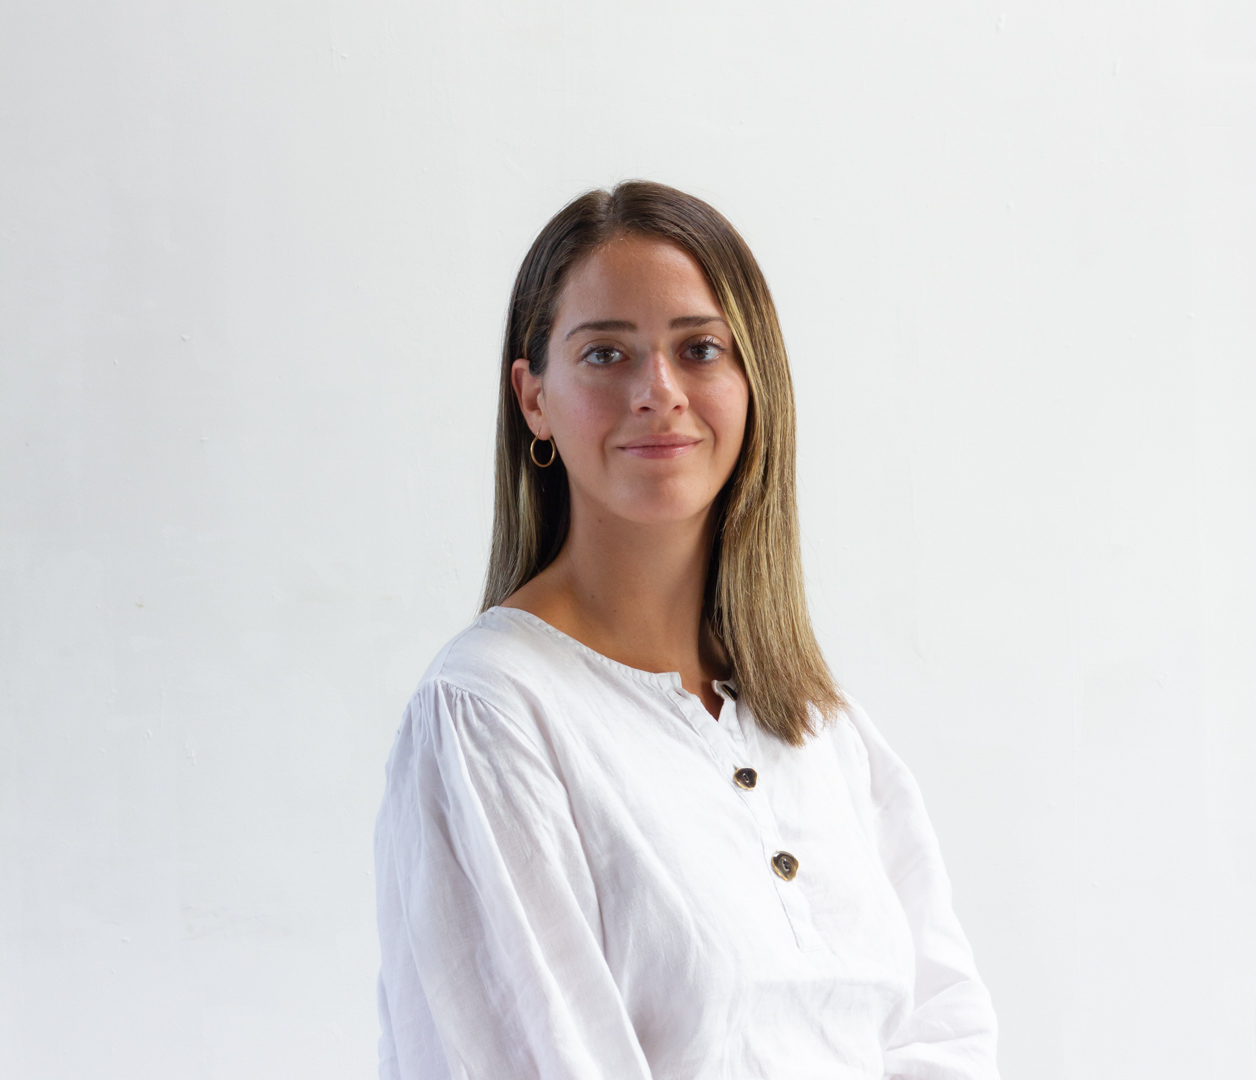 Zacharoula Loizou